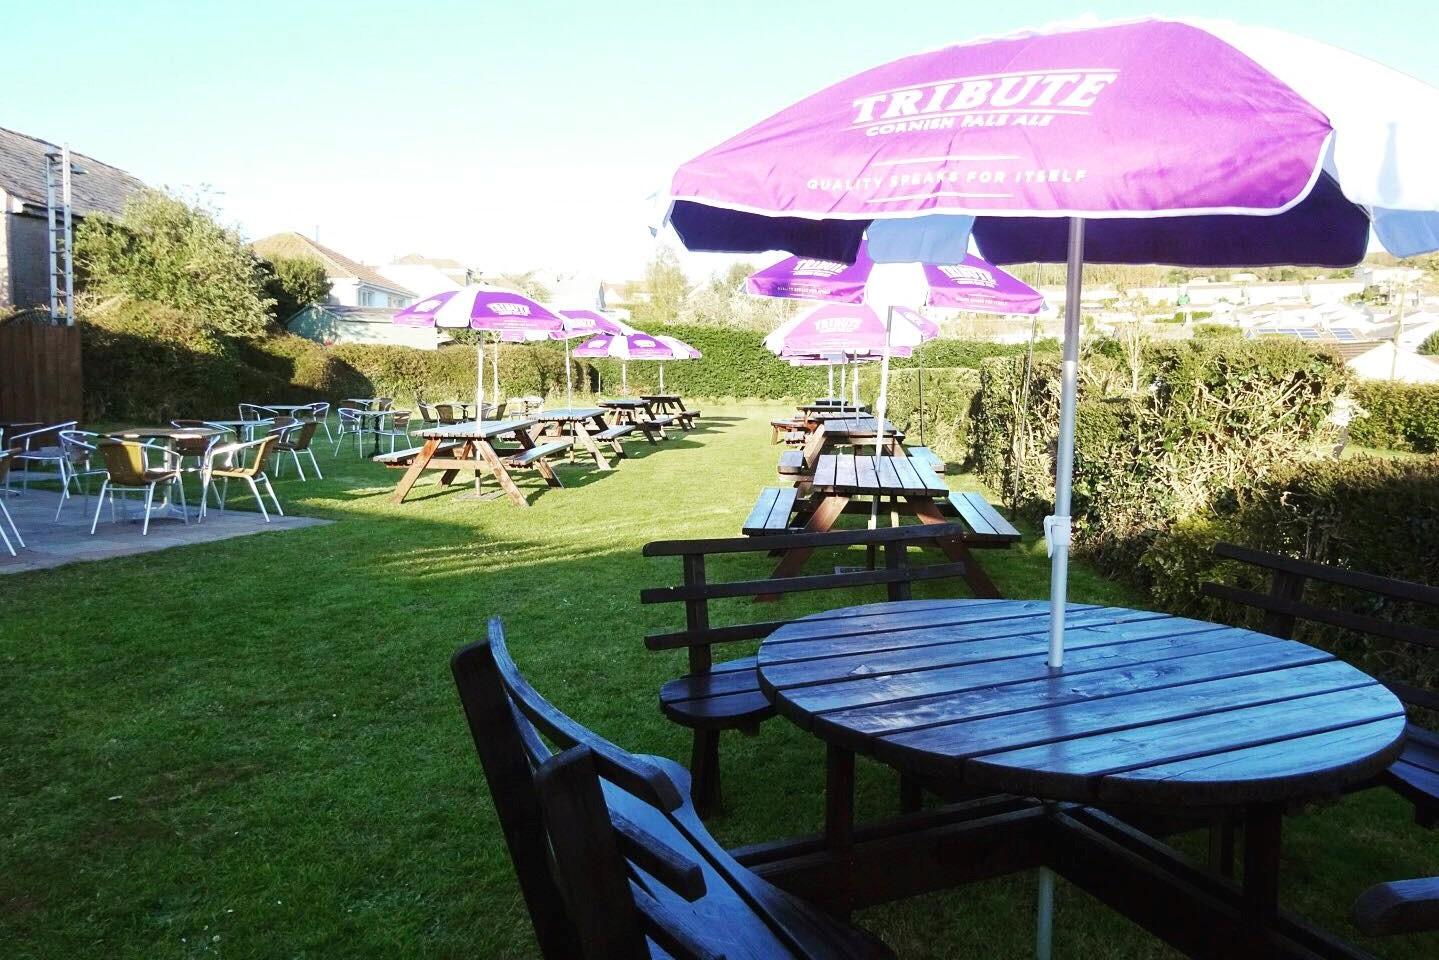 The New Inn Cornwall Beer Garden